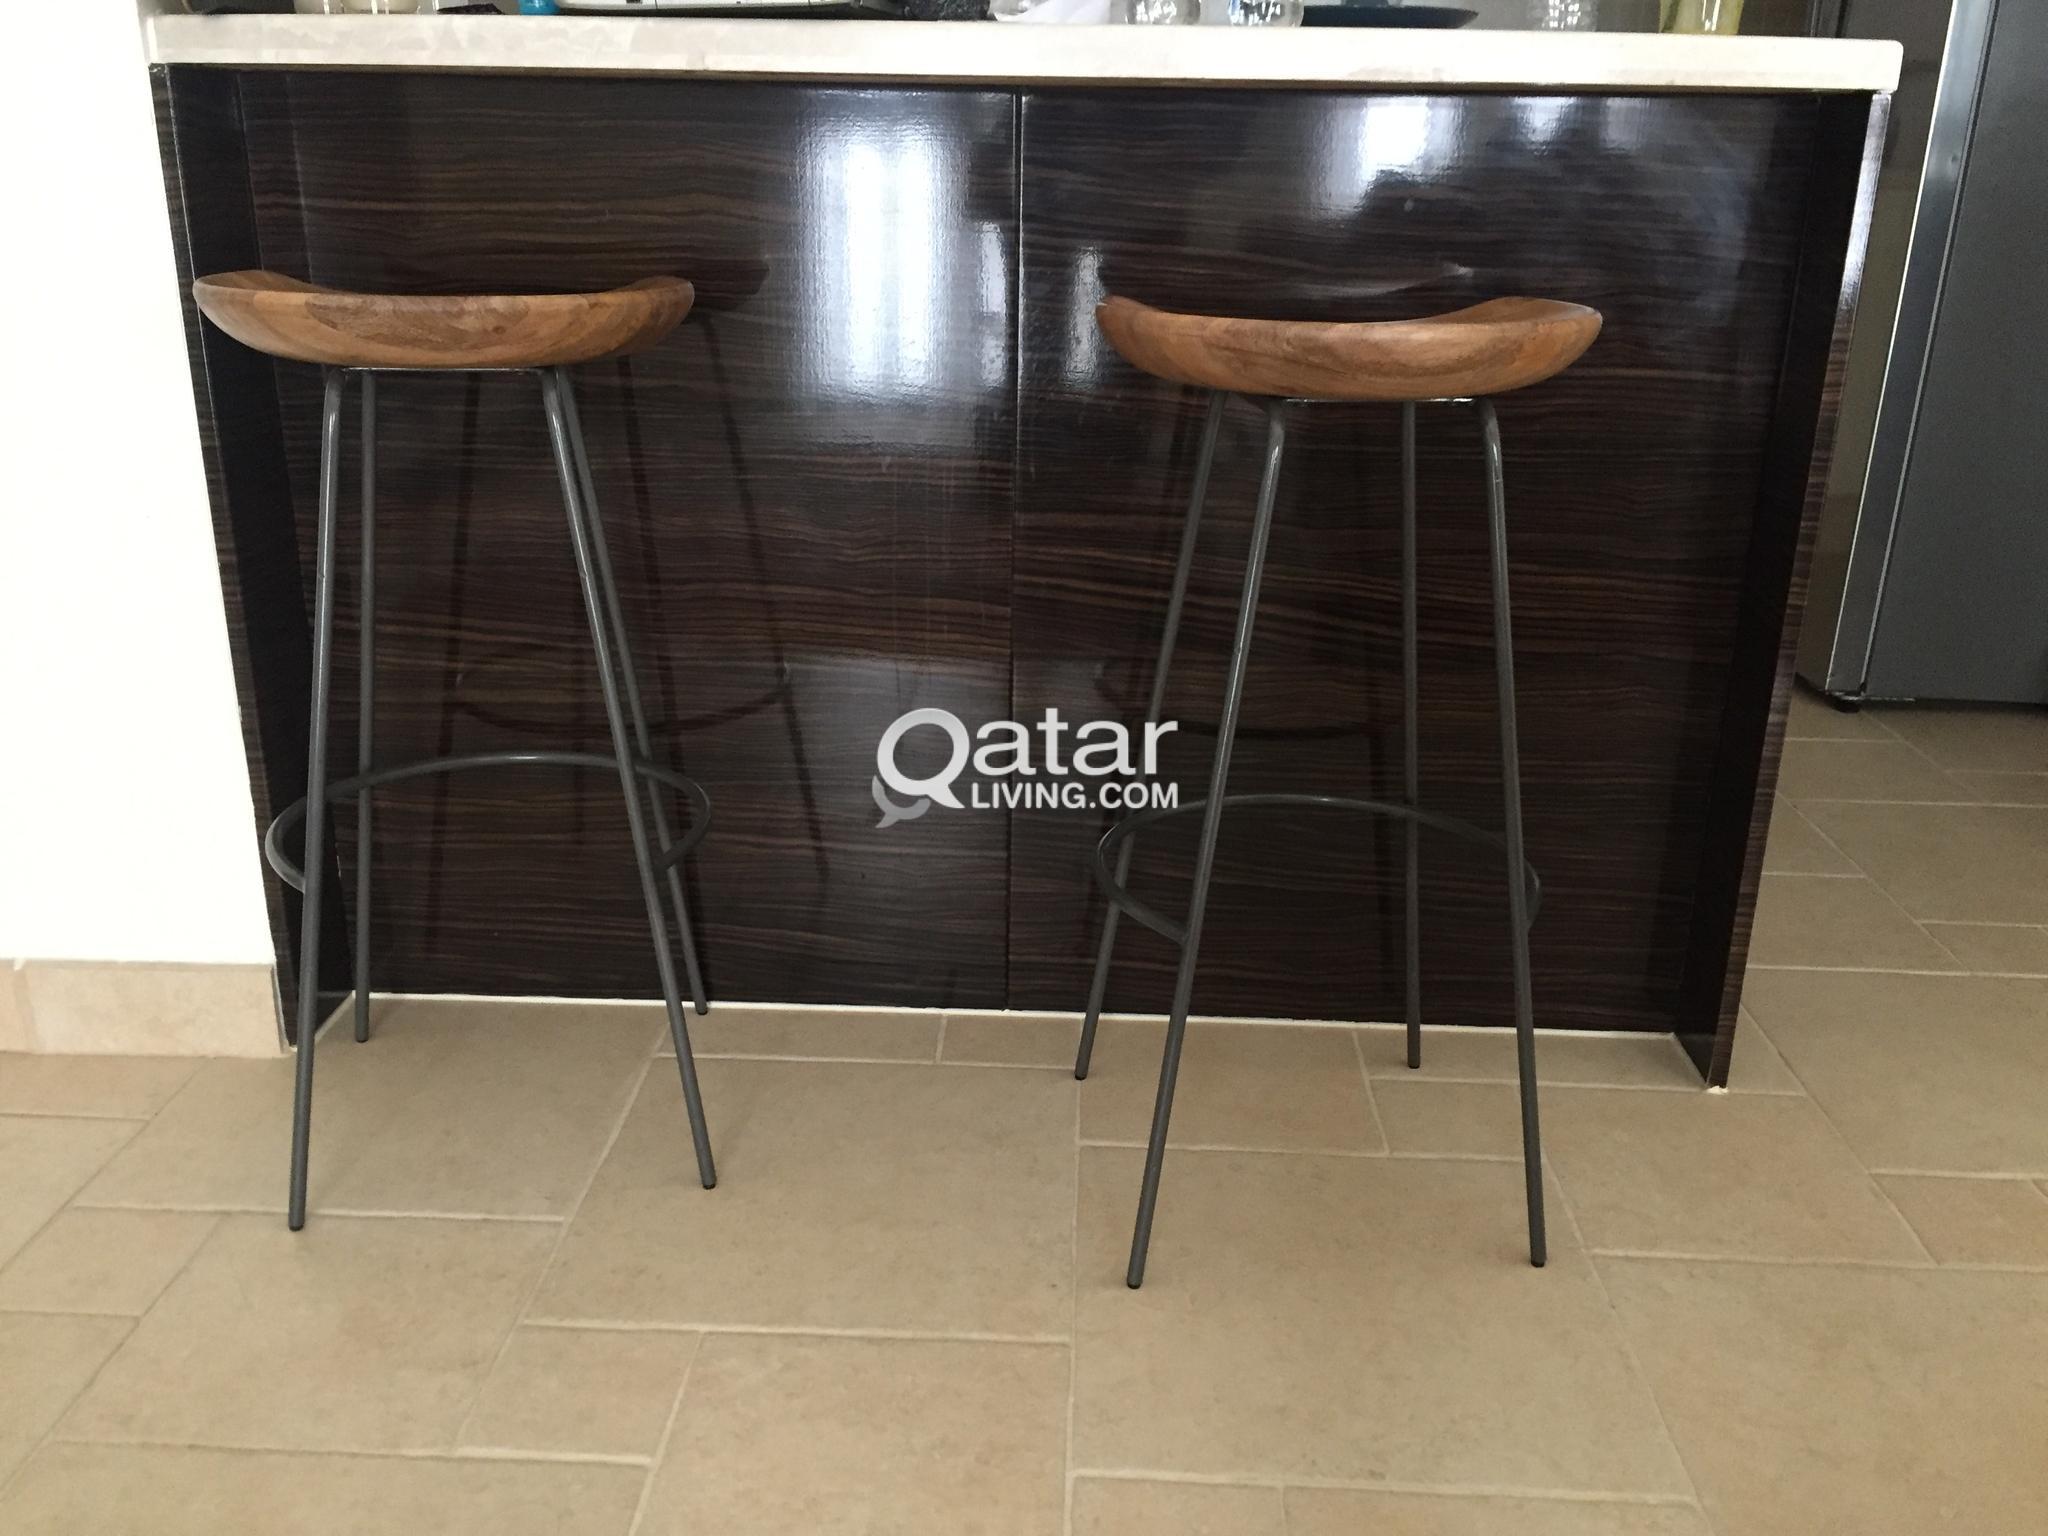 Stupendous West Elm Alden Bar Stools Pair 900 Qr Qatar Living Alphanode Cool Chair Designs And Ideas Alphanodeonline